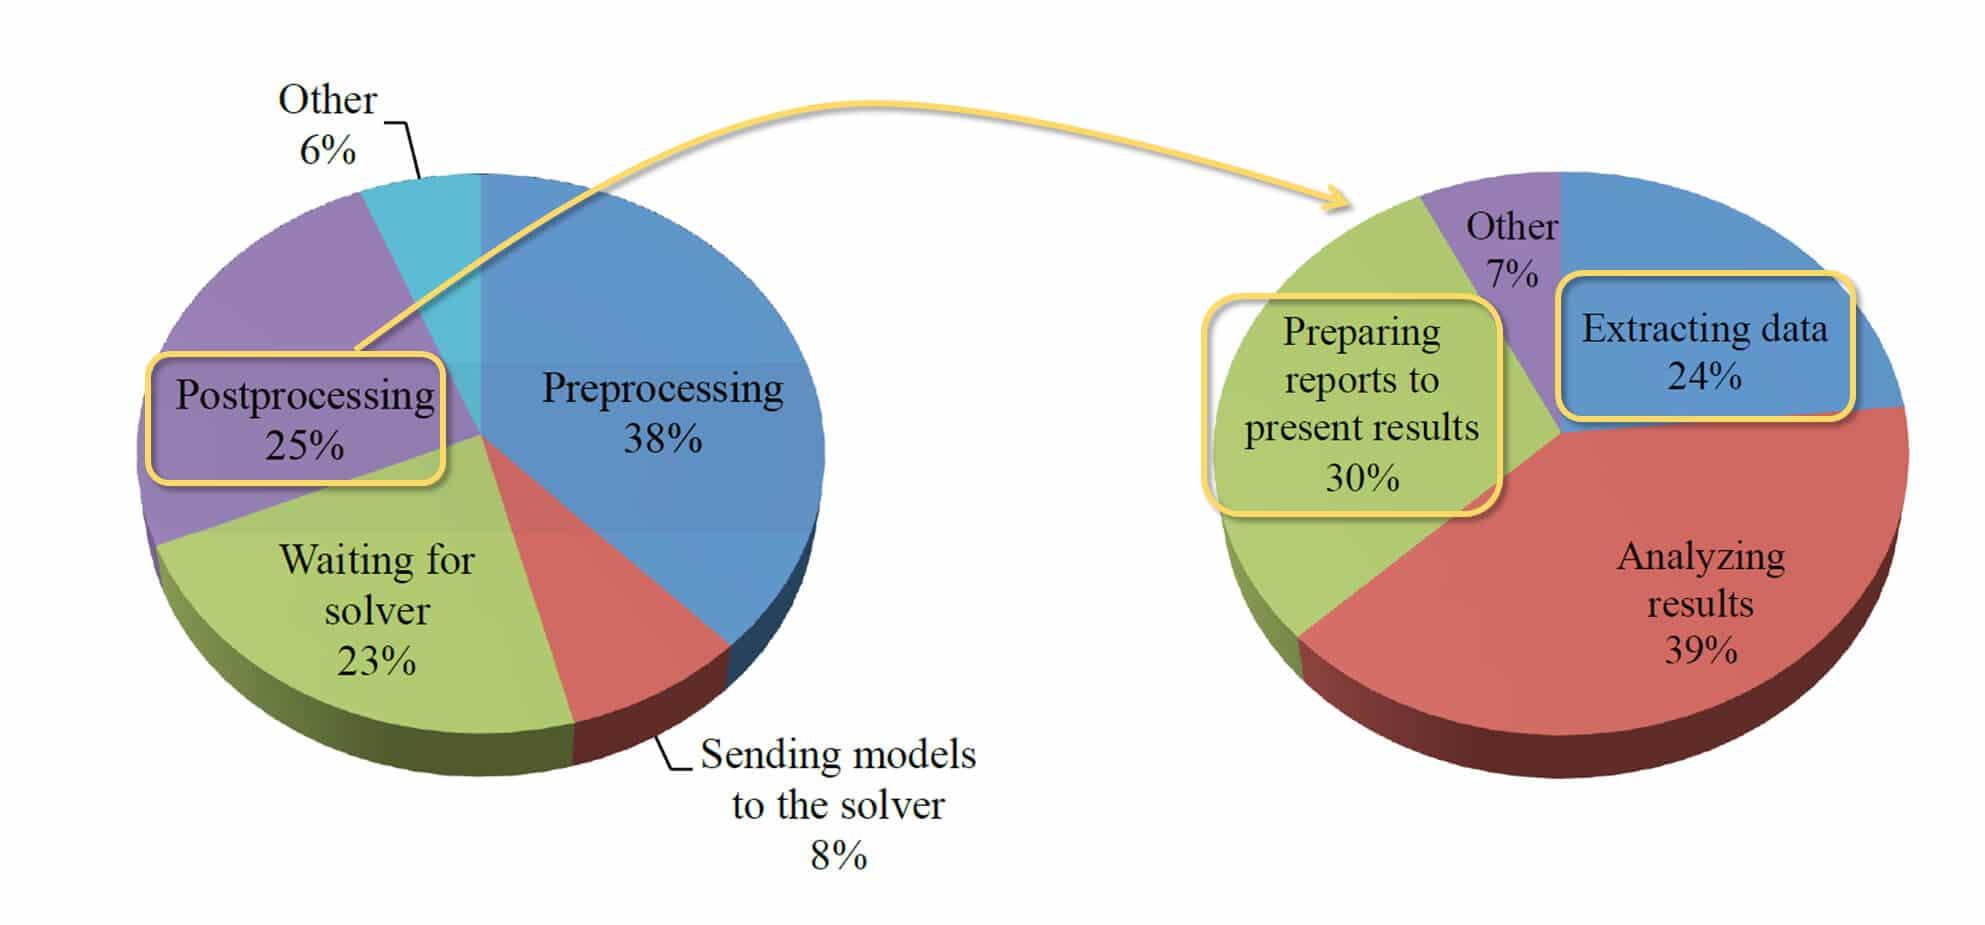 SmartCAE: Post-Processing bottlenecks